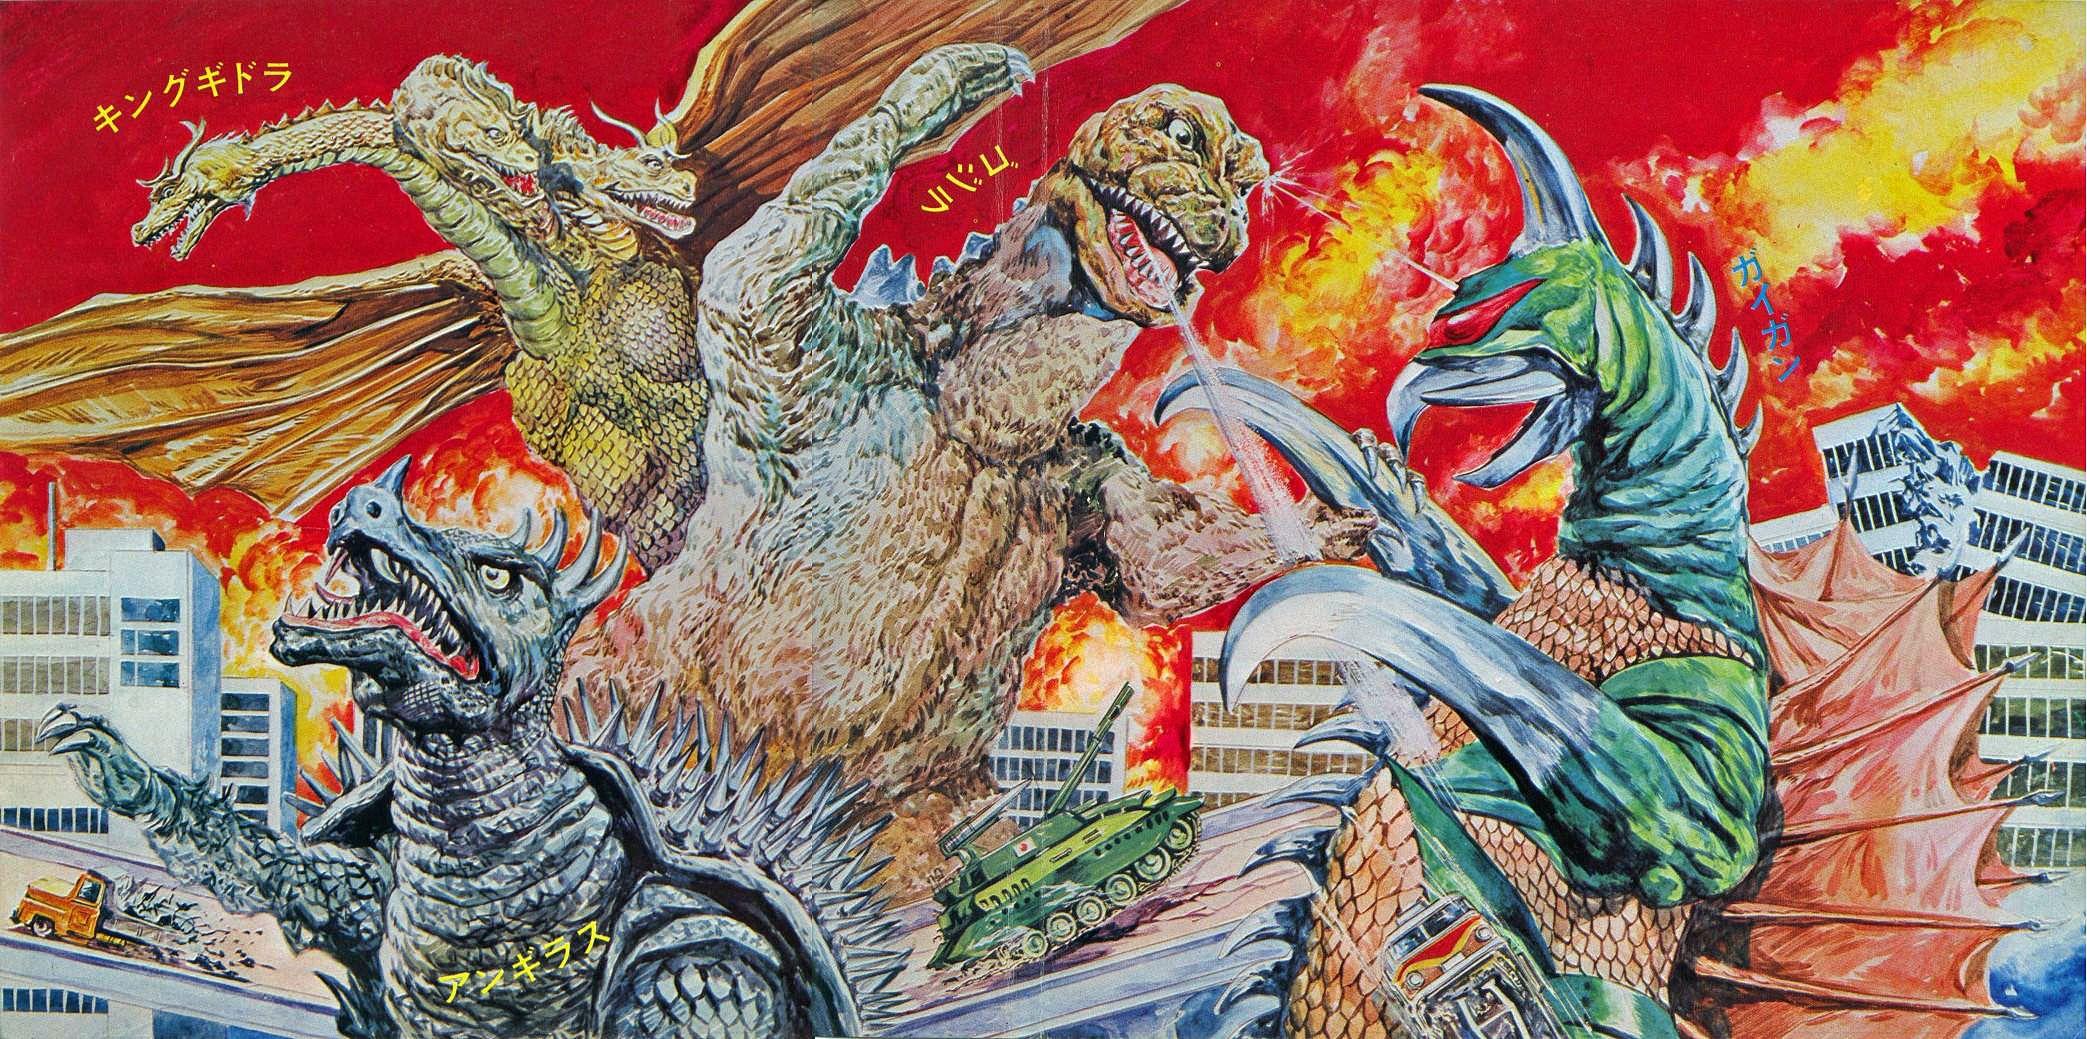 Anguirus and Godzilla vs Gigan and King Ghidorah in GODZILLA VS GIGAN  (1972) | Godzilla, Cine